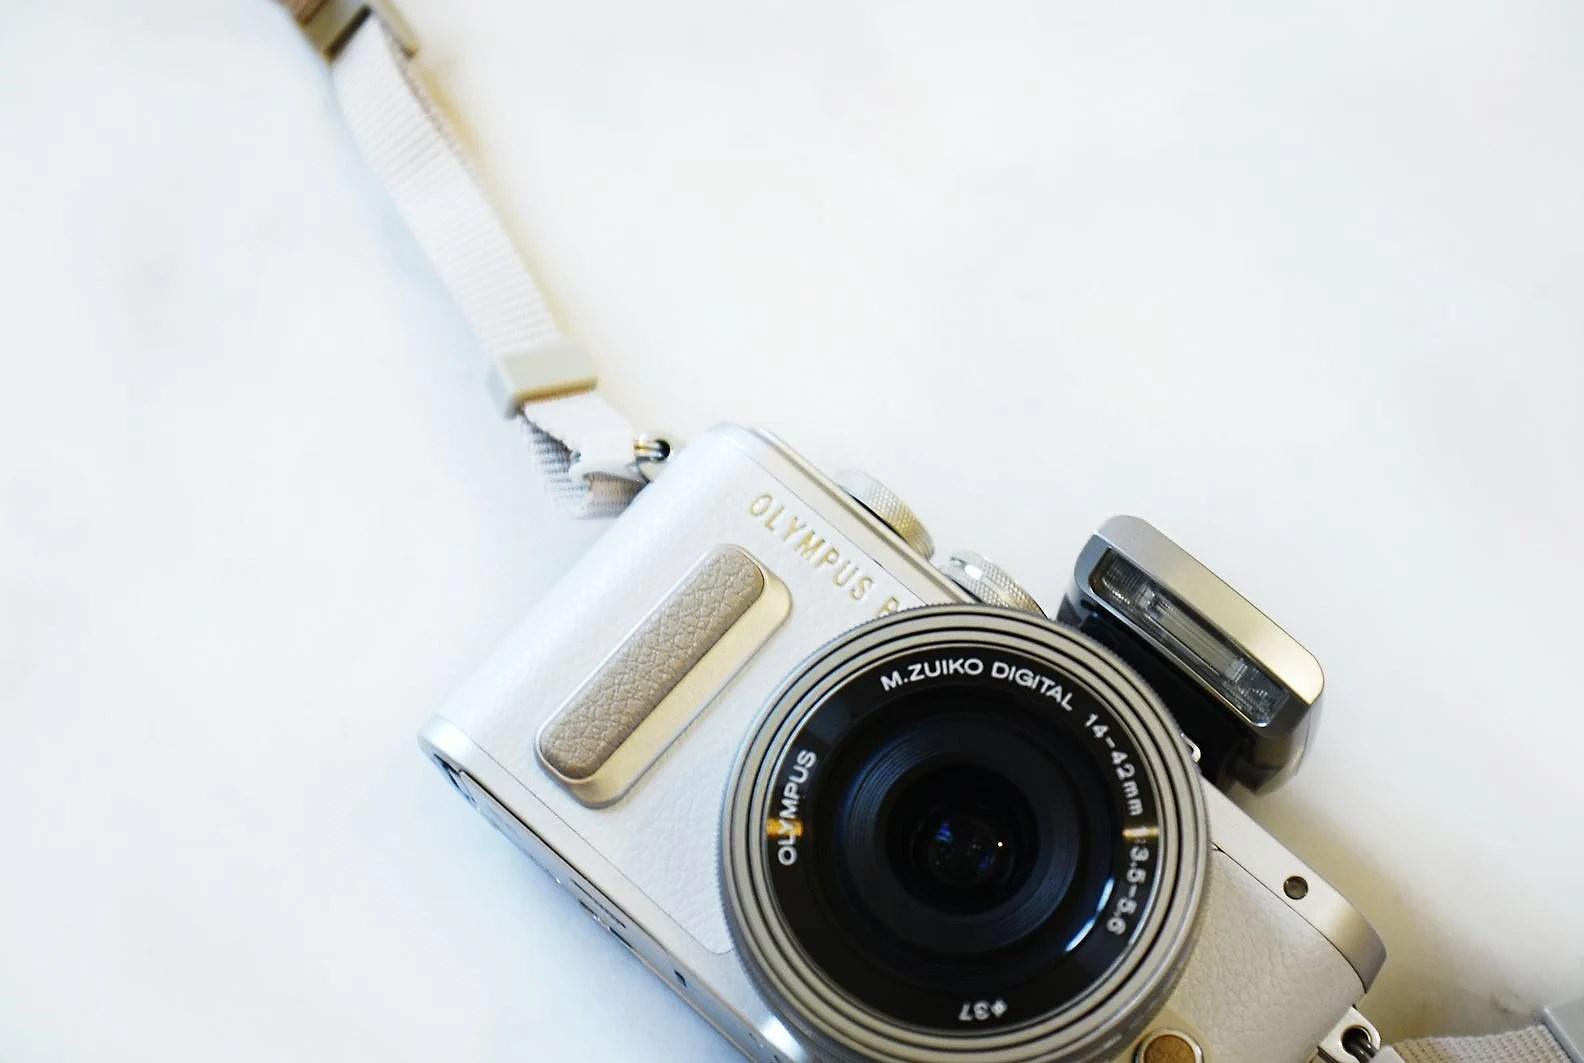 New camera + event snack